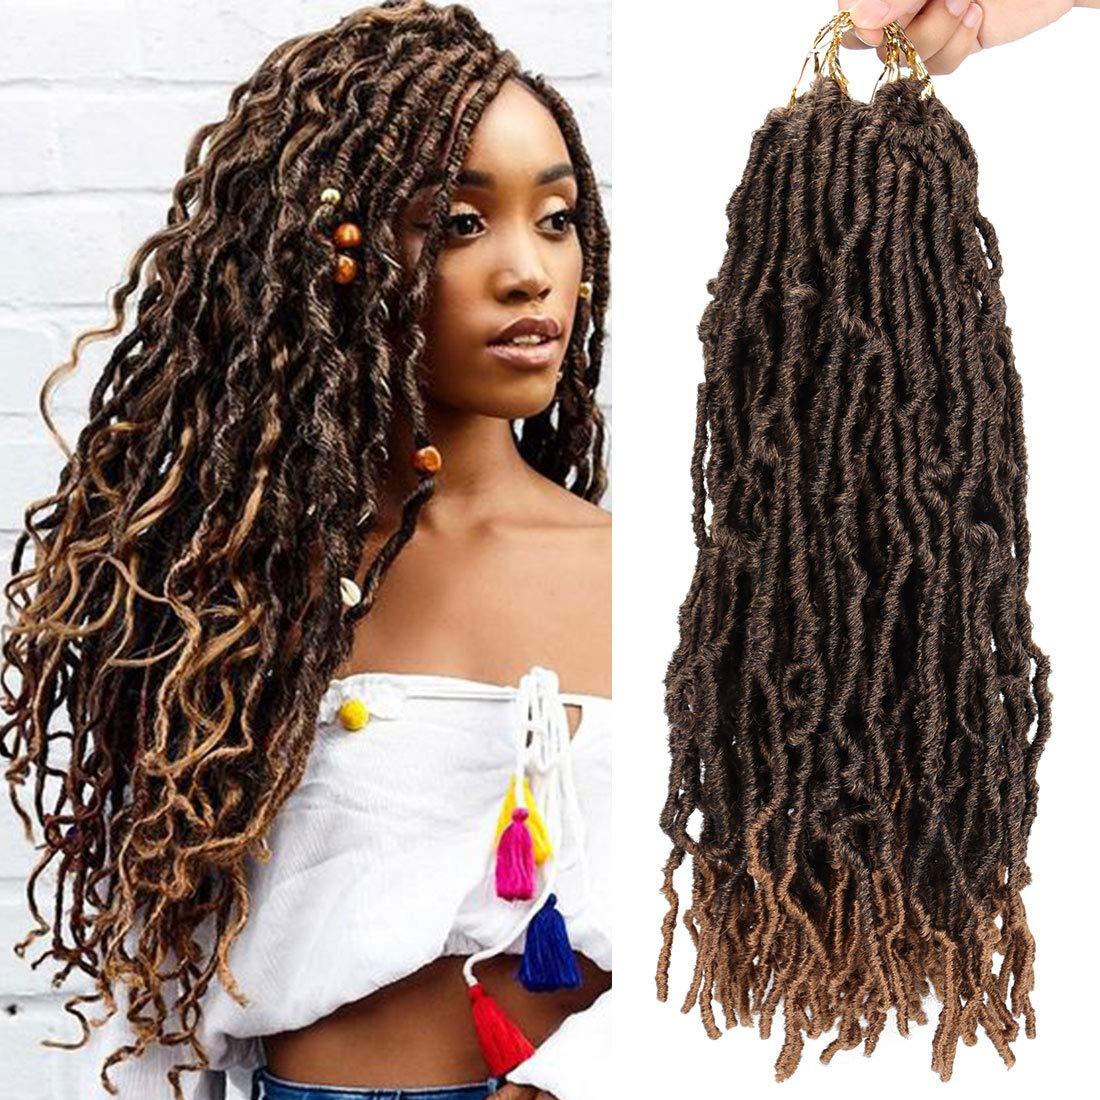 1 Pack Nu Soft Locs Crochet Braids 18inch Goddess Faux Locs Crochet Hair Soft Gypsy Loc Crochet Curly Wavy Twist Synthetic Braiding Hair African Roots Dreadlocks Hair Extensions (18 roots,T1B/27)